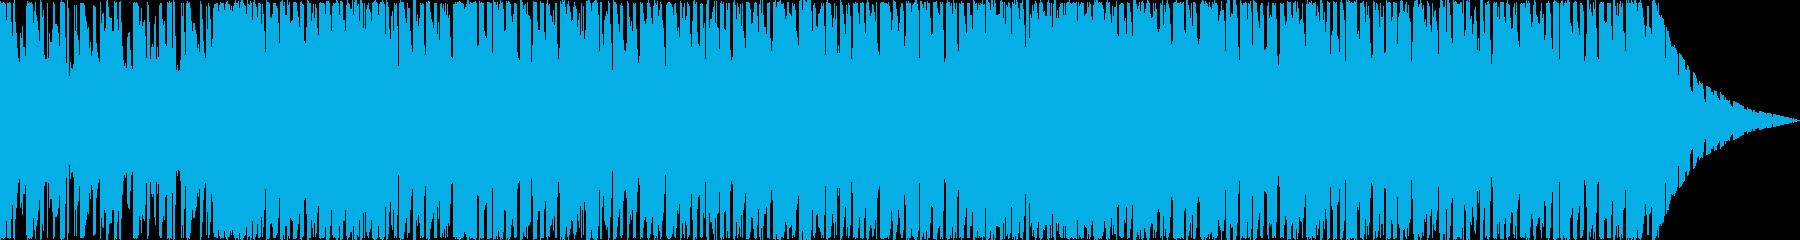 DanceTecno系30sの再生済みの波形